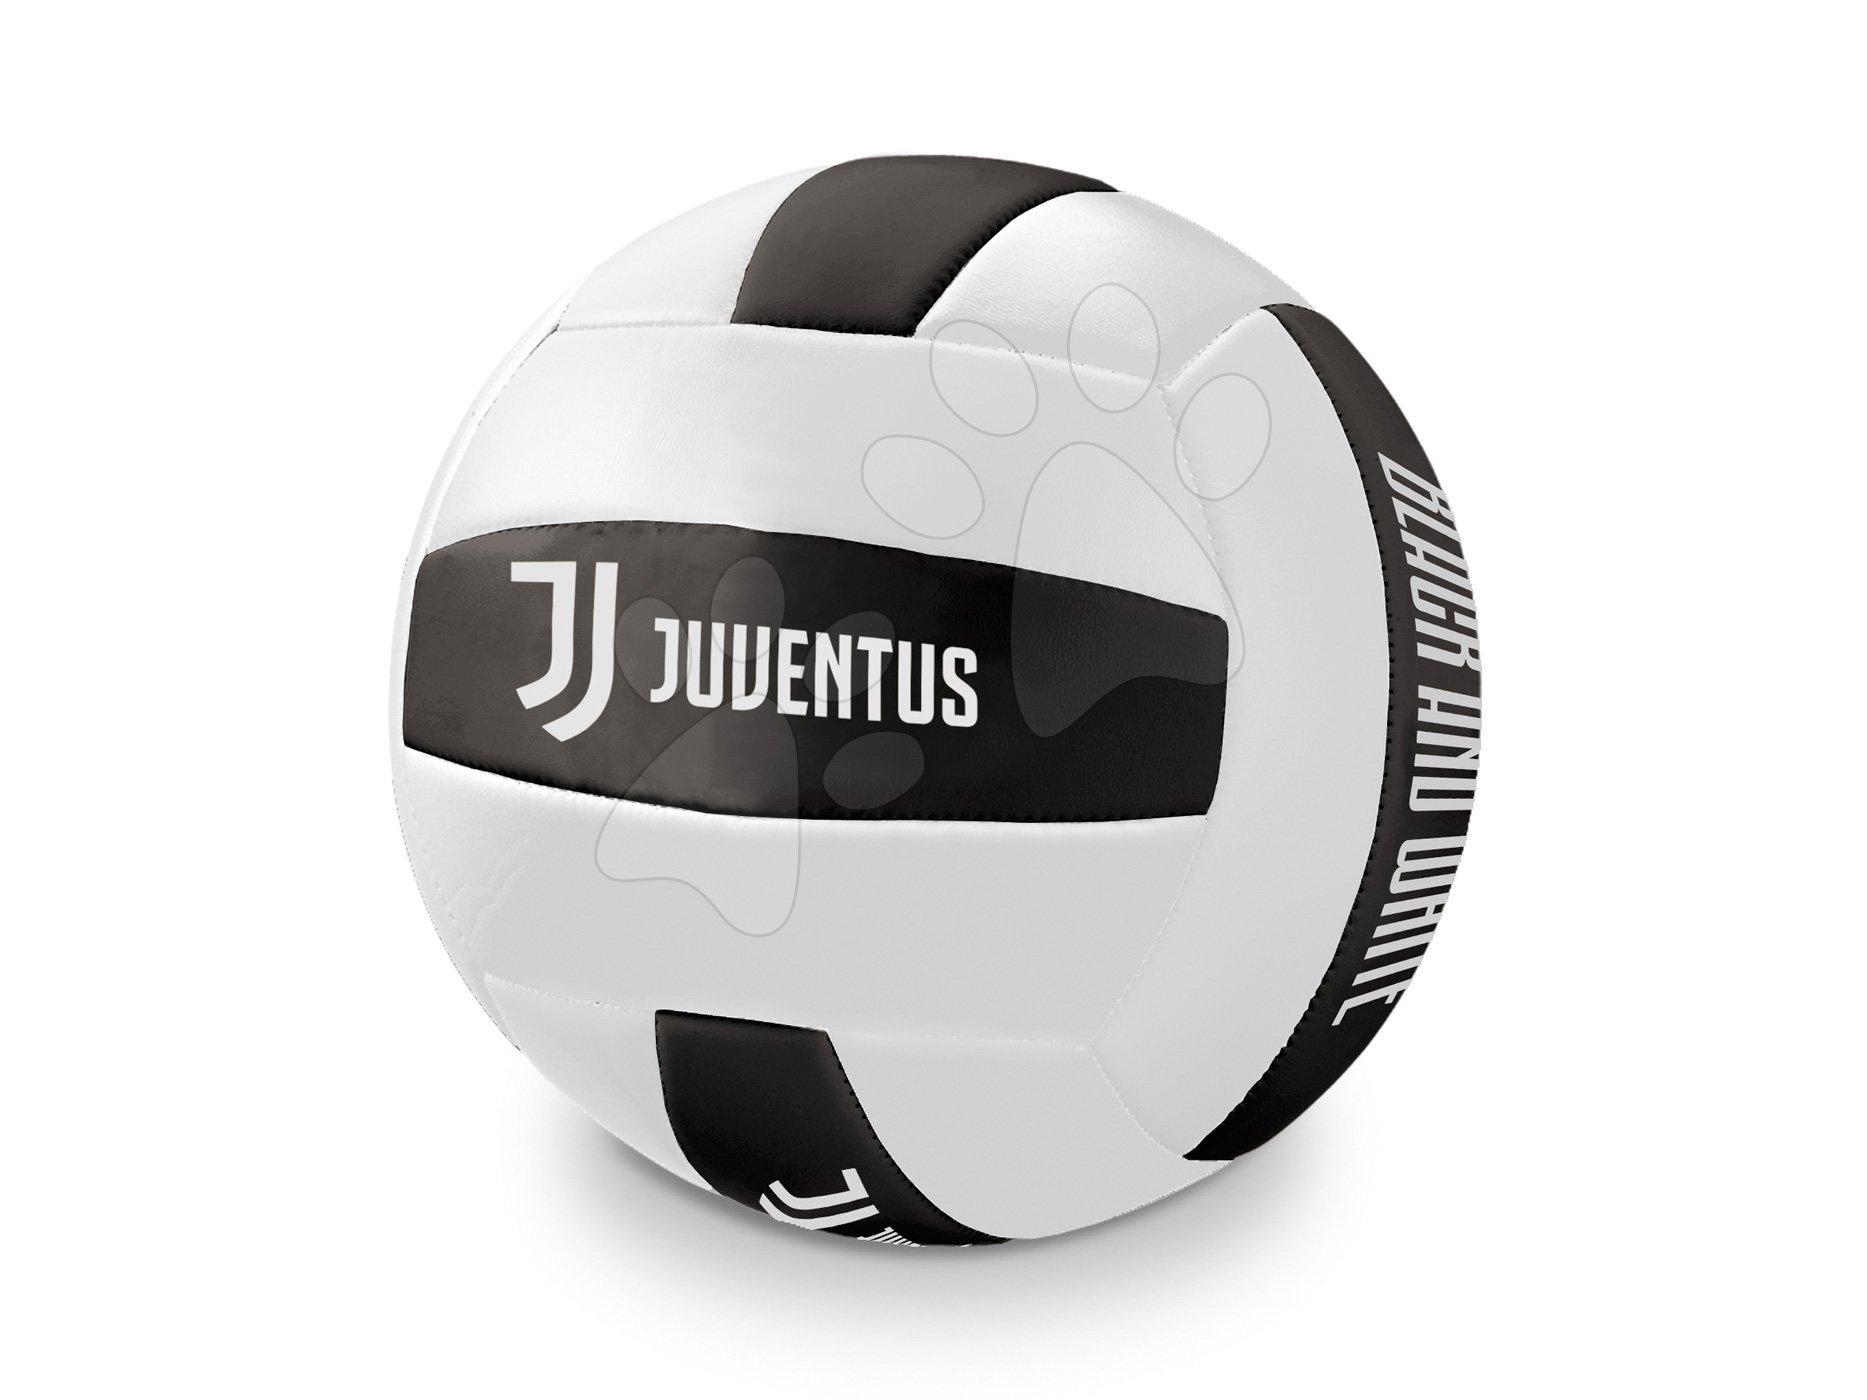 Röplabda varrott  F.C. Juventus Mondo méret 5 súly 270 g